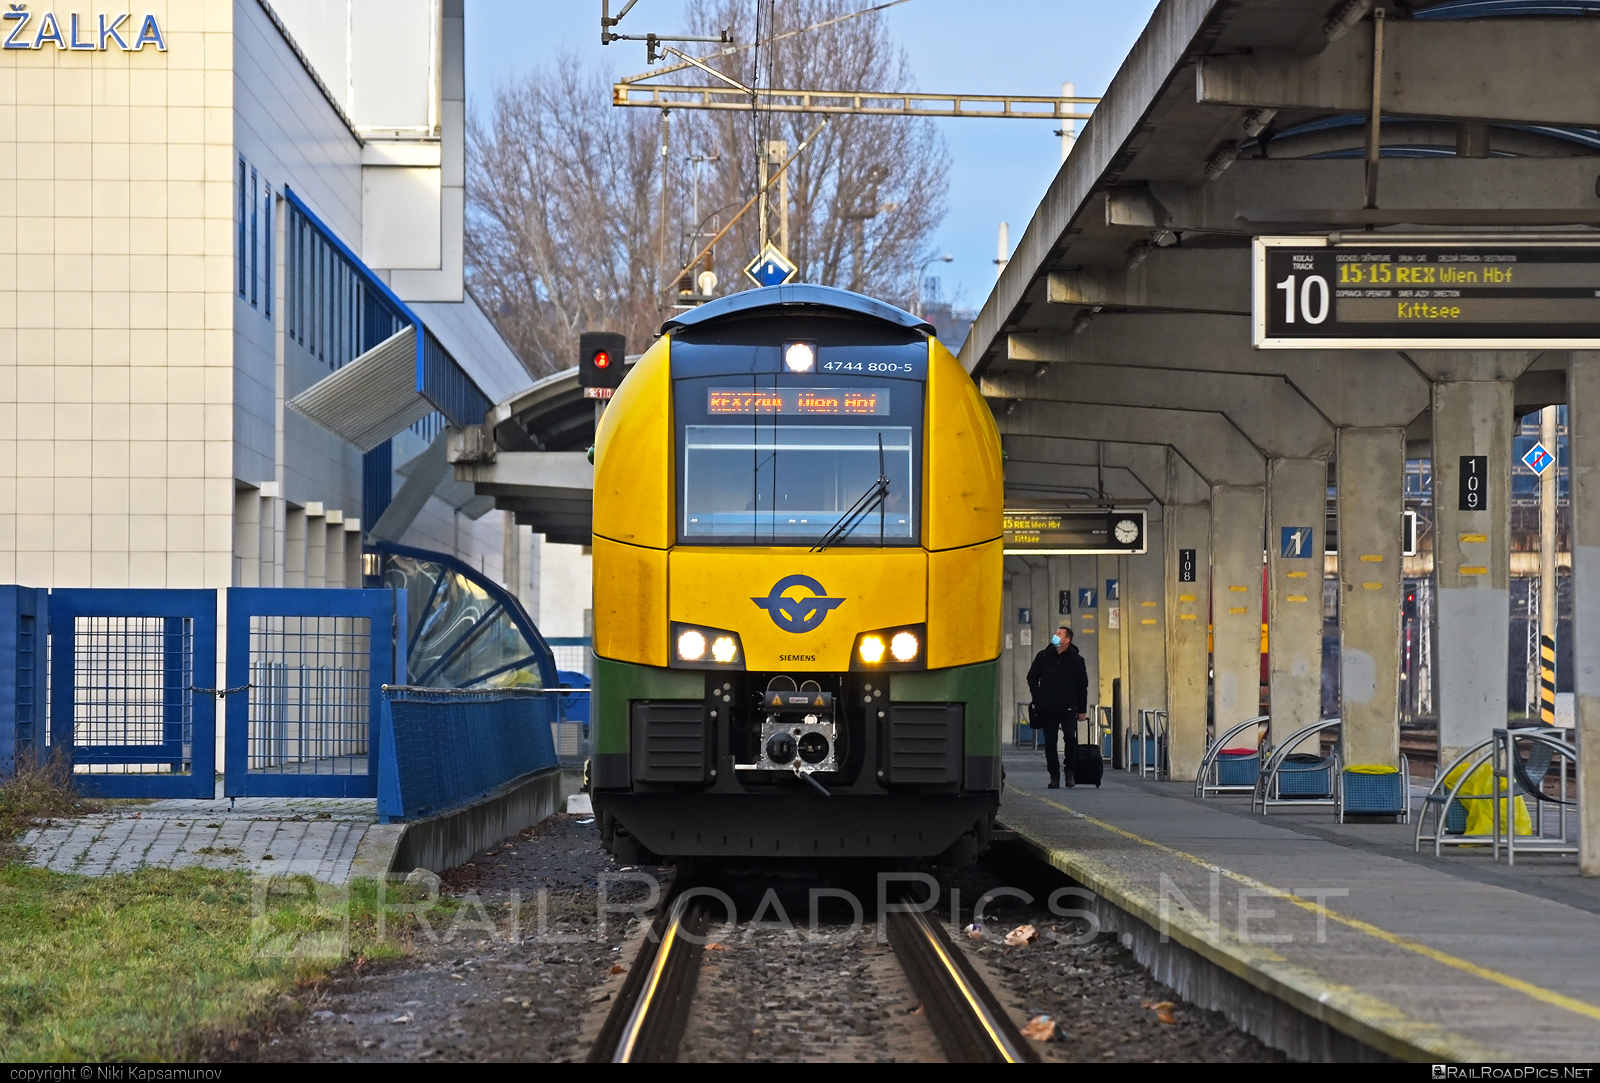 Siemens Desiro ML - 4744 800-5 operated by GYSEV - Györ-Sopron-Ebenfurti Vasut Részvénytarsasag #desiro #desiroml #gyorsopronebenfurtivasutreszvenytarsasag #gysev #raaberbahn #raaboedenburgebenfurtereisenbahn #raaboedenburgebenfurtereisenbahnag #roeee #siemens #siemensdesiro #siemensdesiroml #ventus